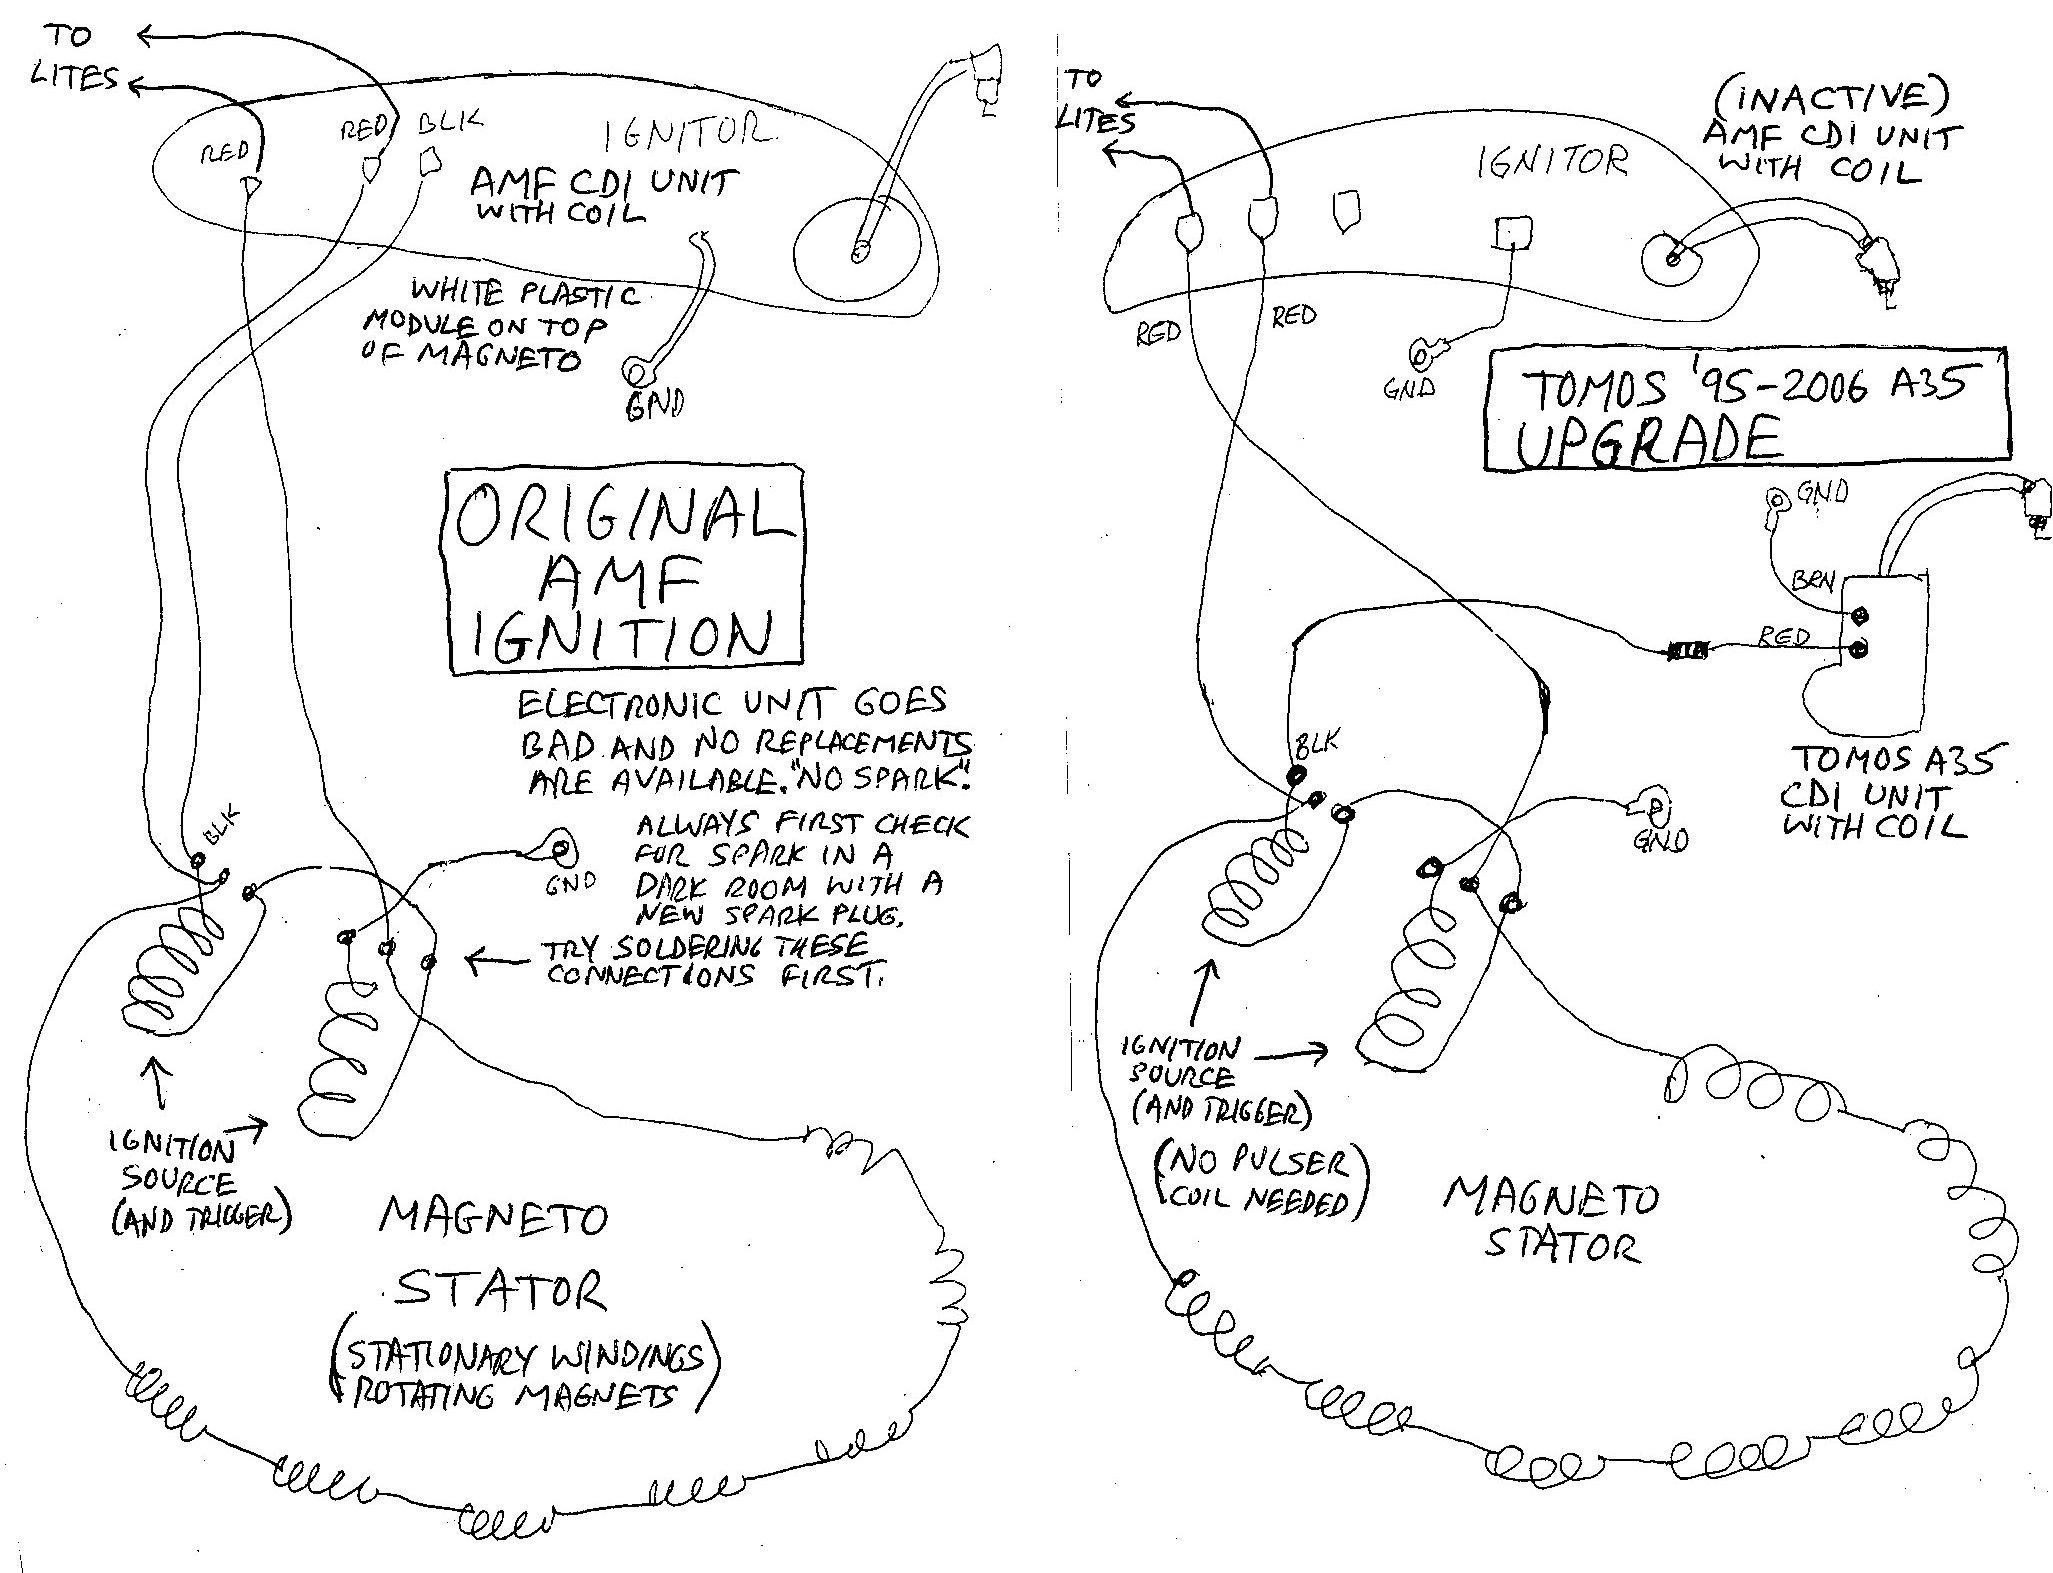 amf roadmaster moped wiring diagram 1978 honda moped